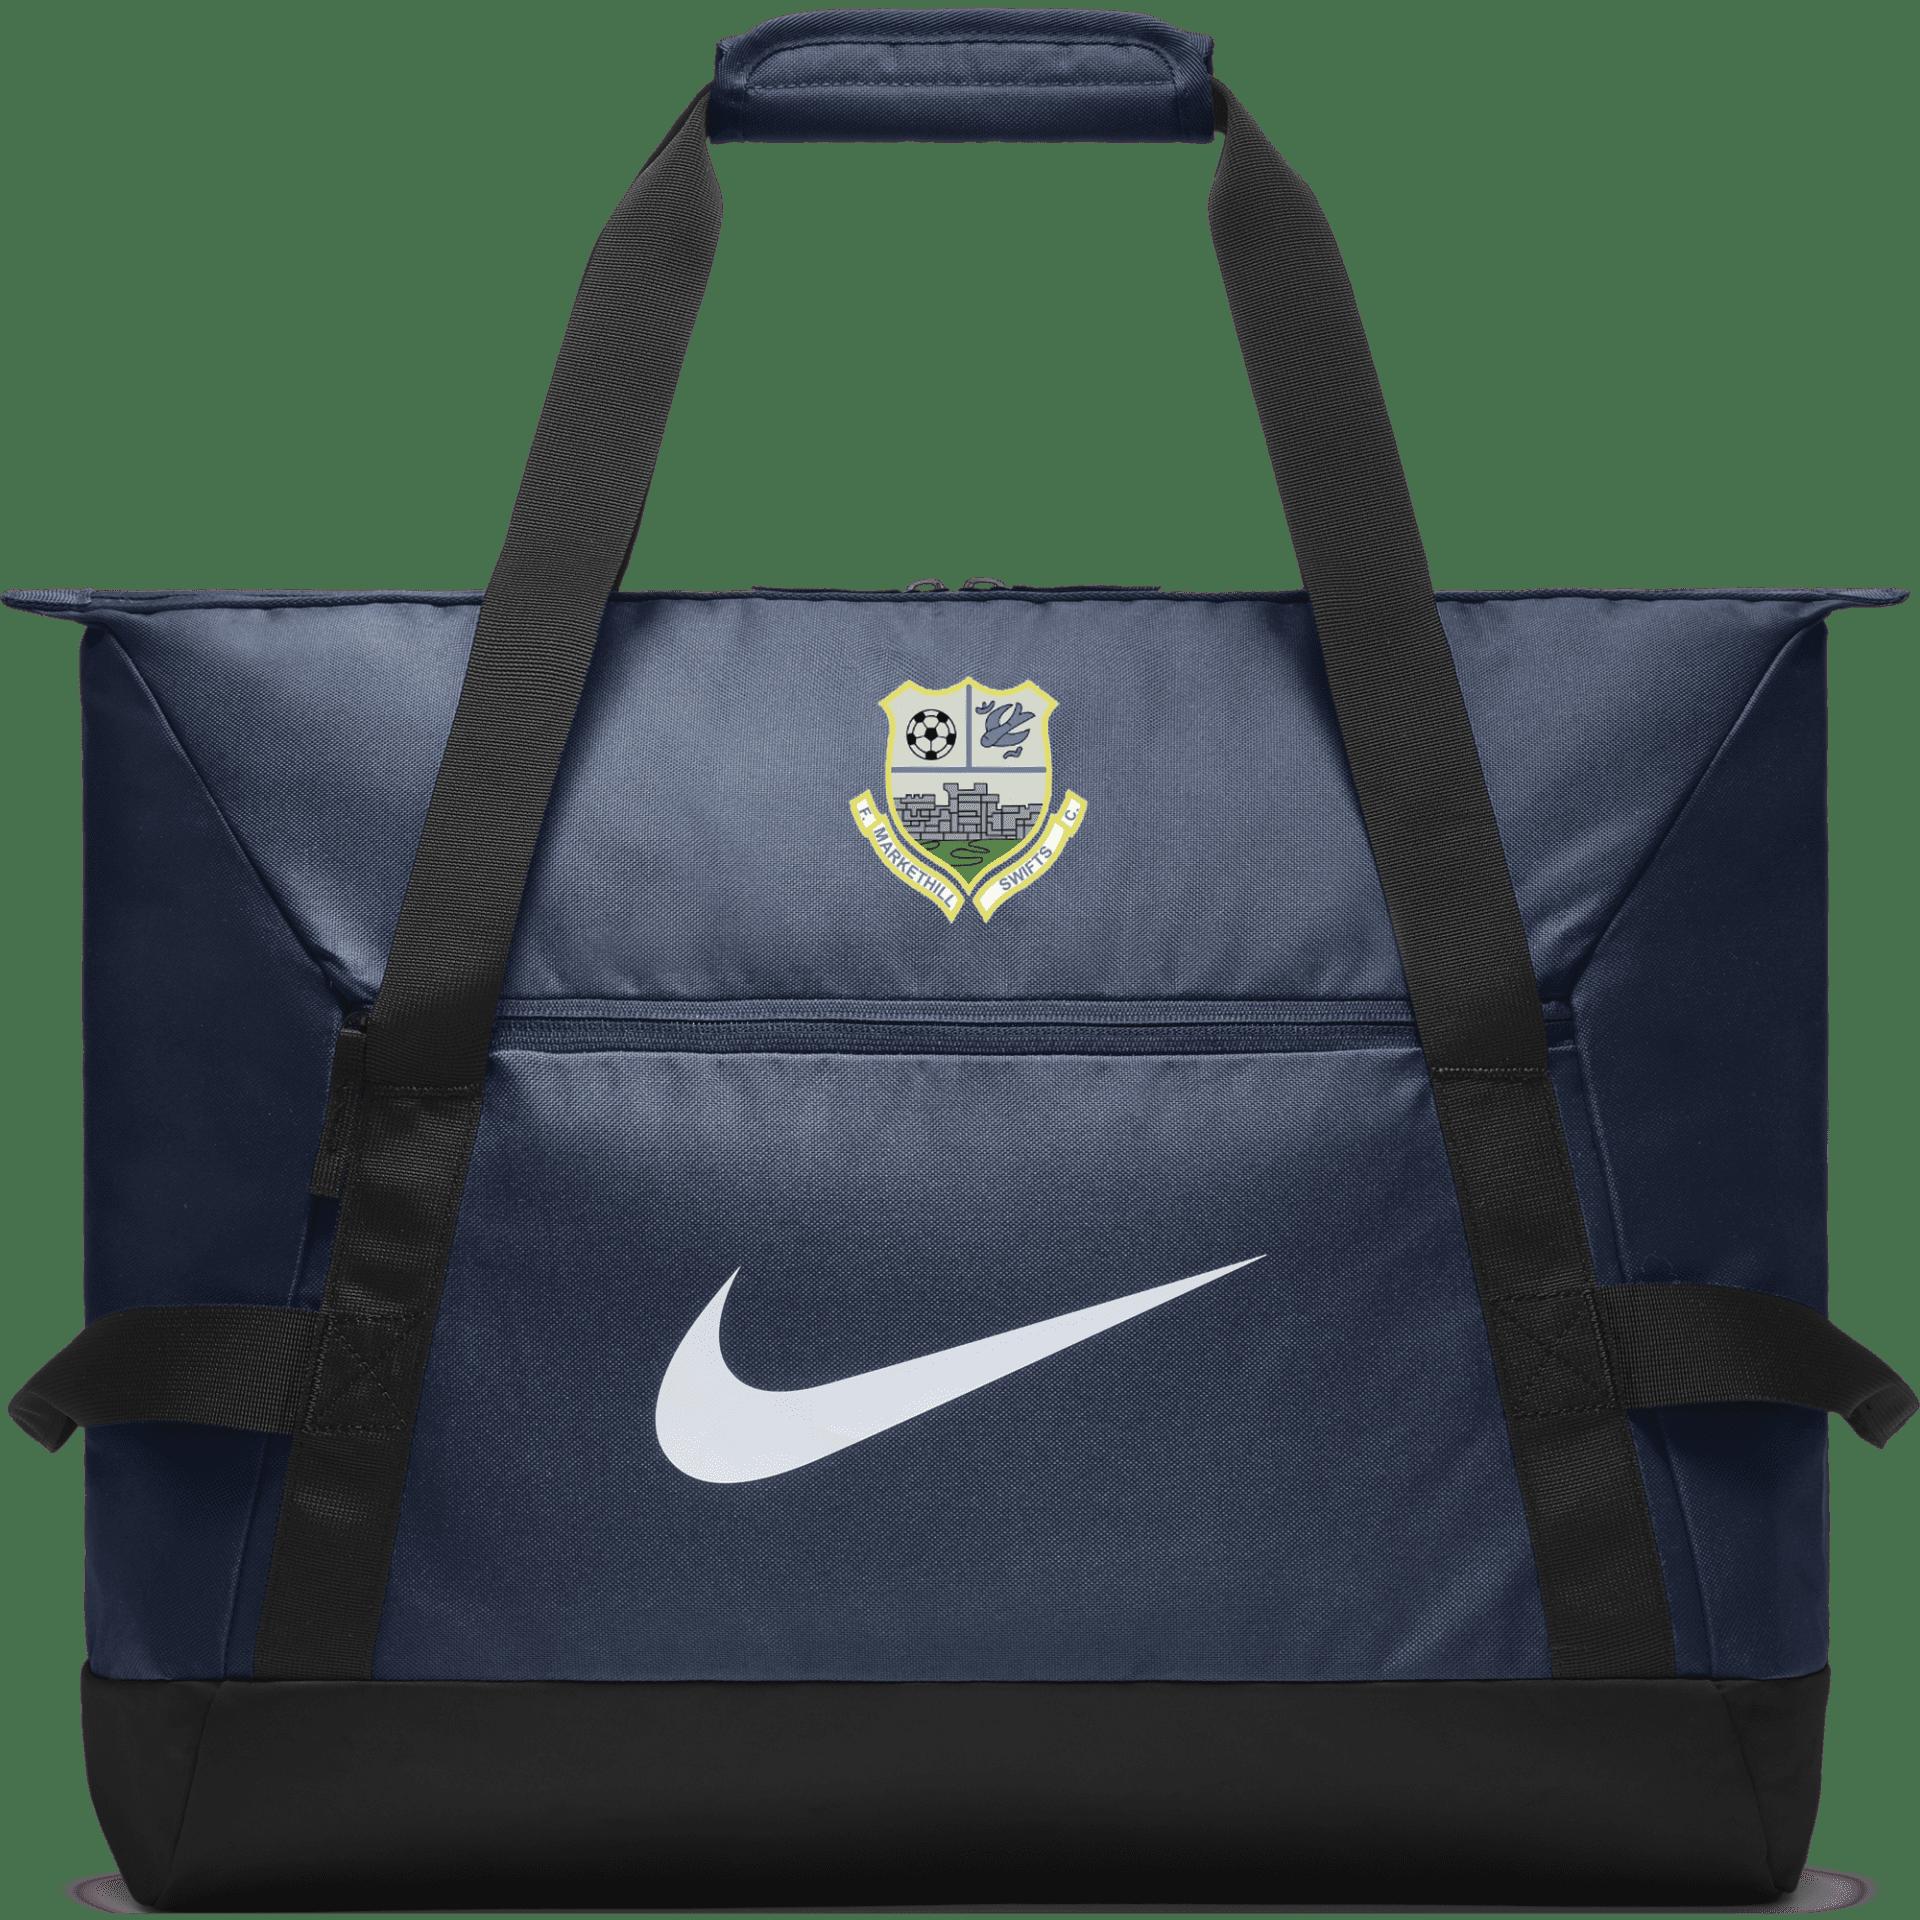 markethill swifts fc bag 27891 p